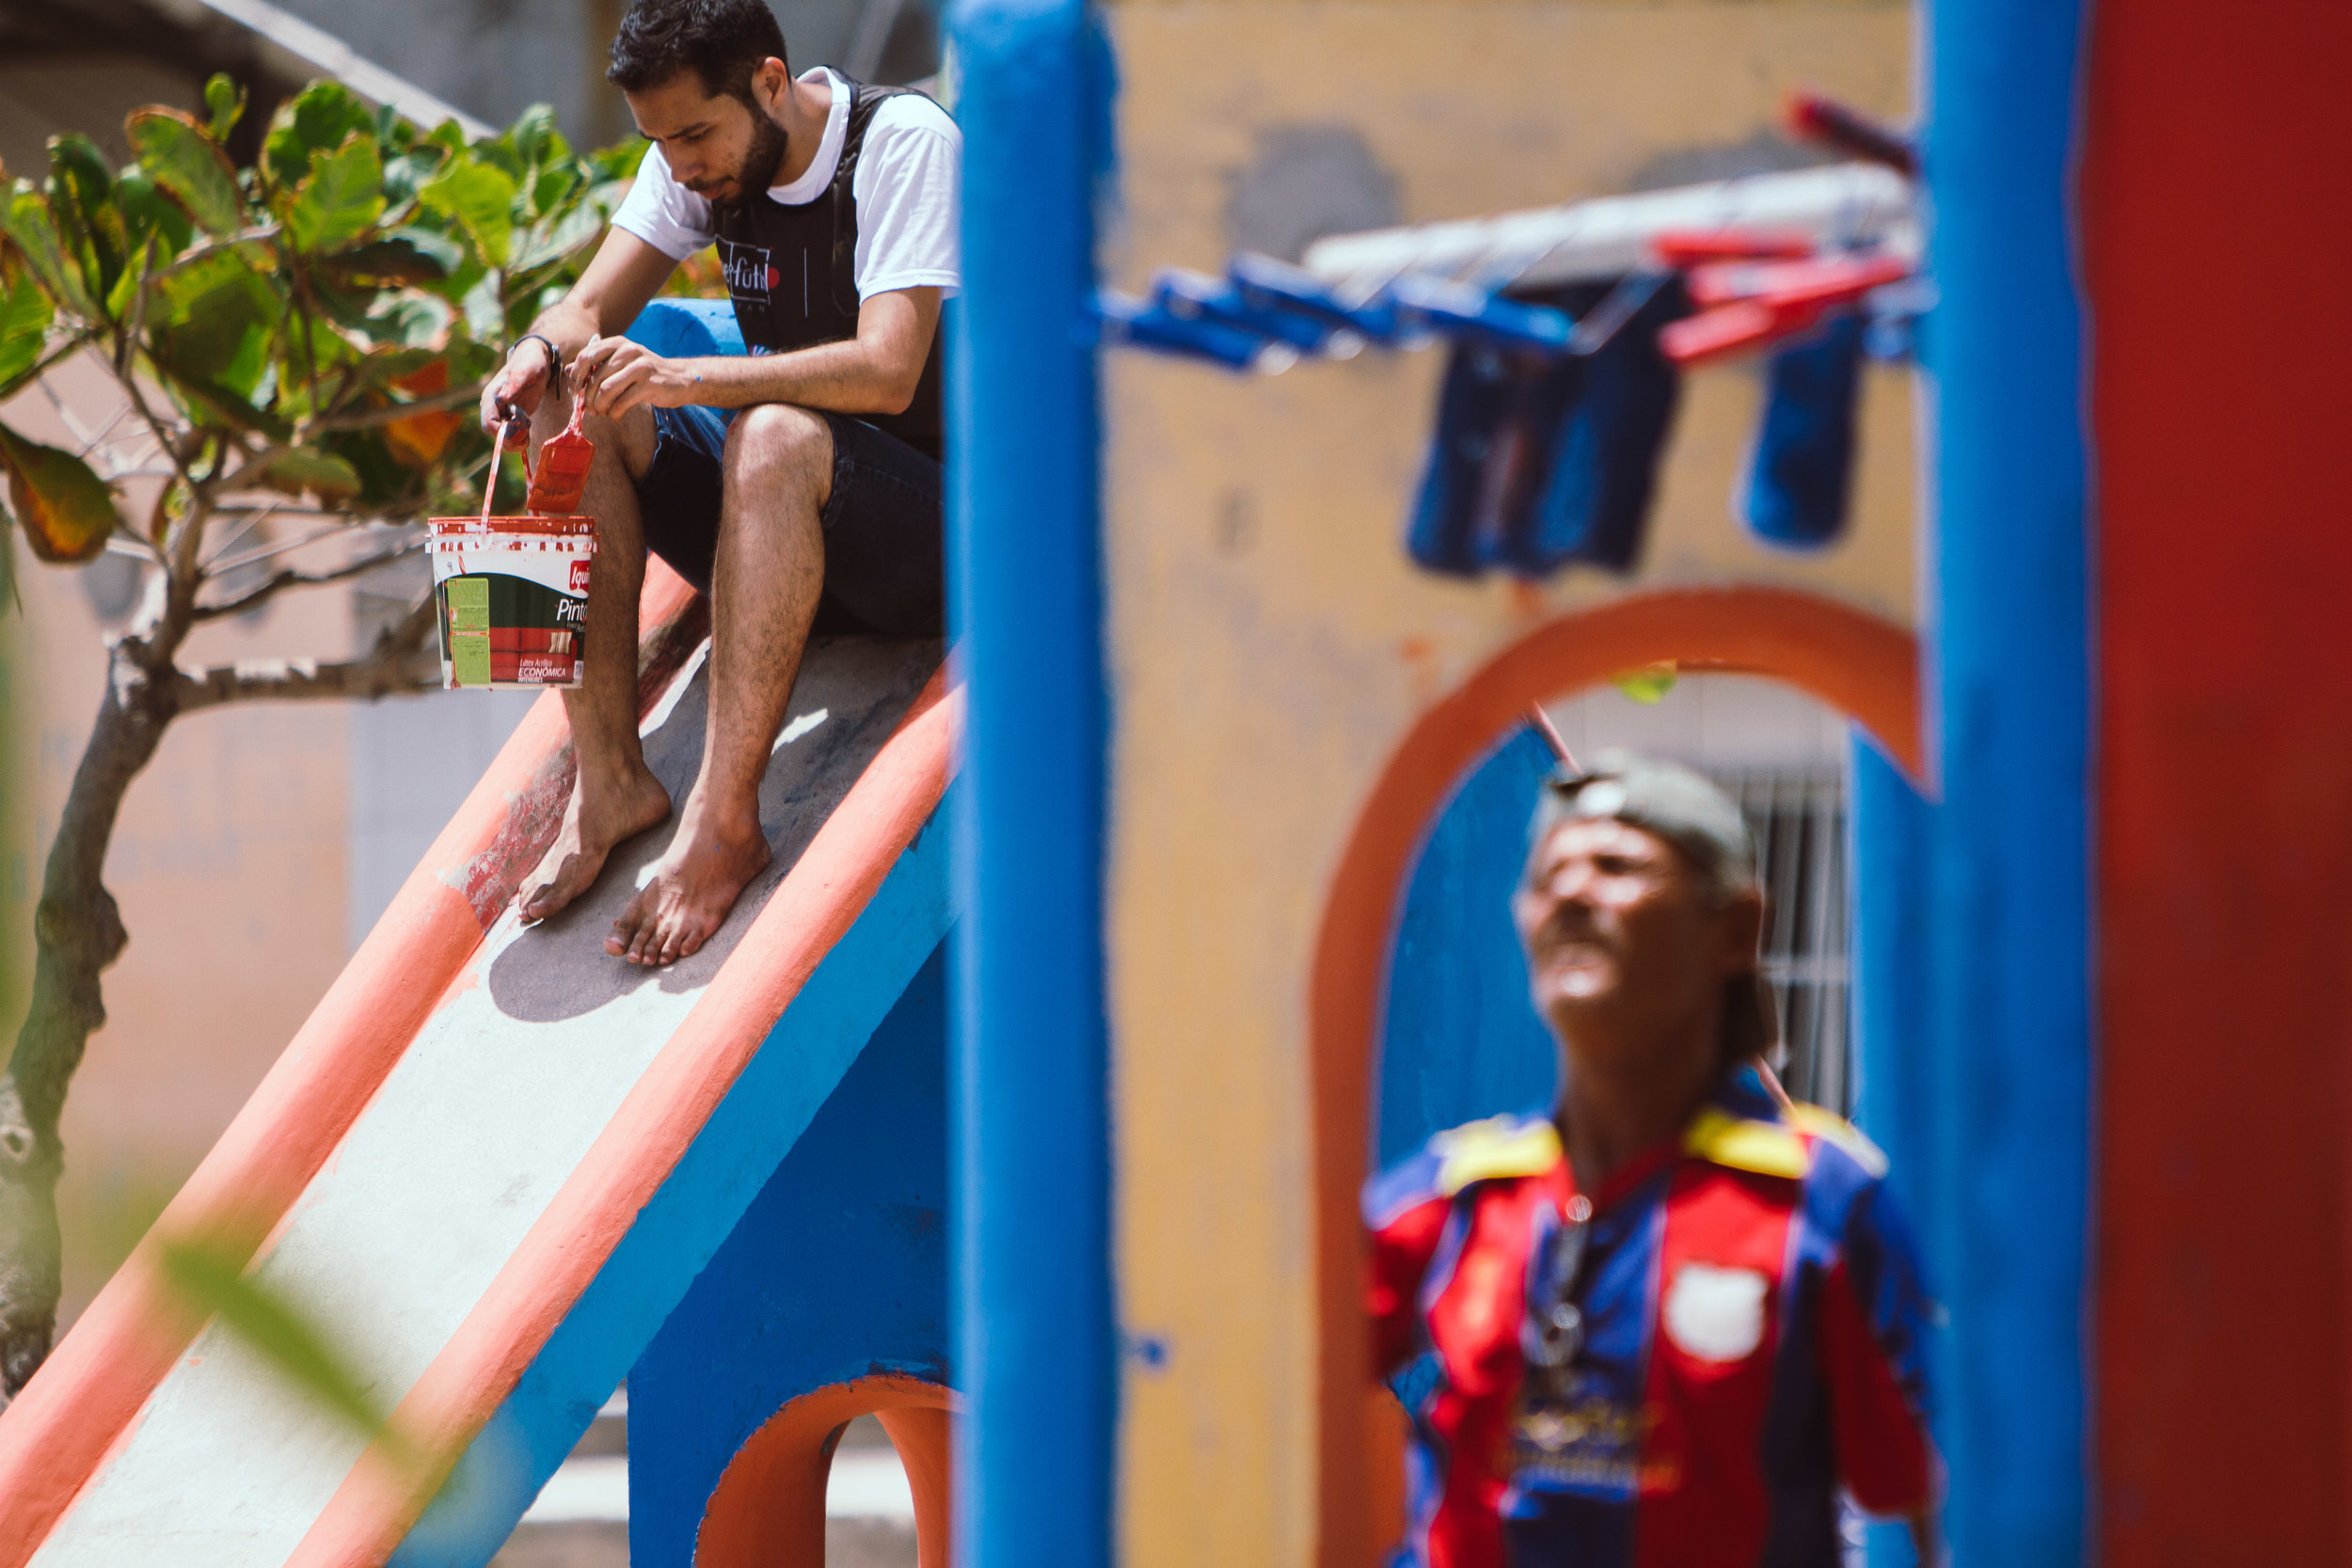 Copy of MUTIRAO BRASILIA TEIMOSA_PB TEIMOSA_PRISCILLABUHR-141.jpg